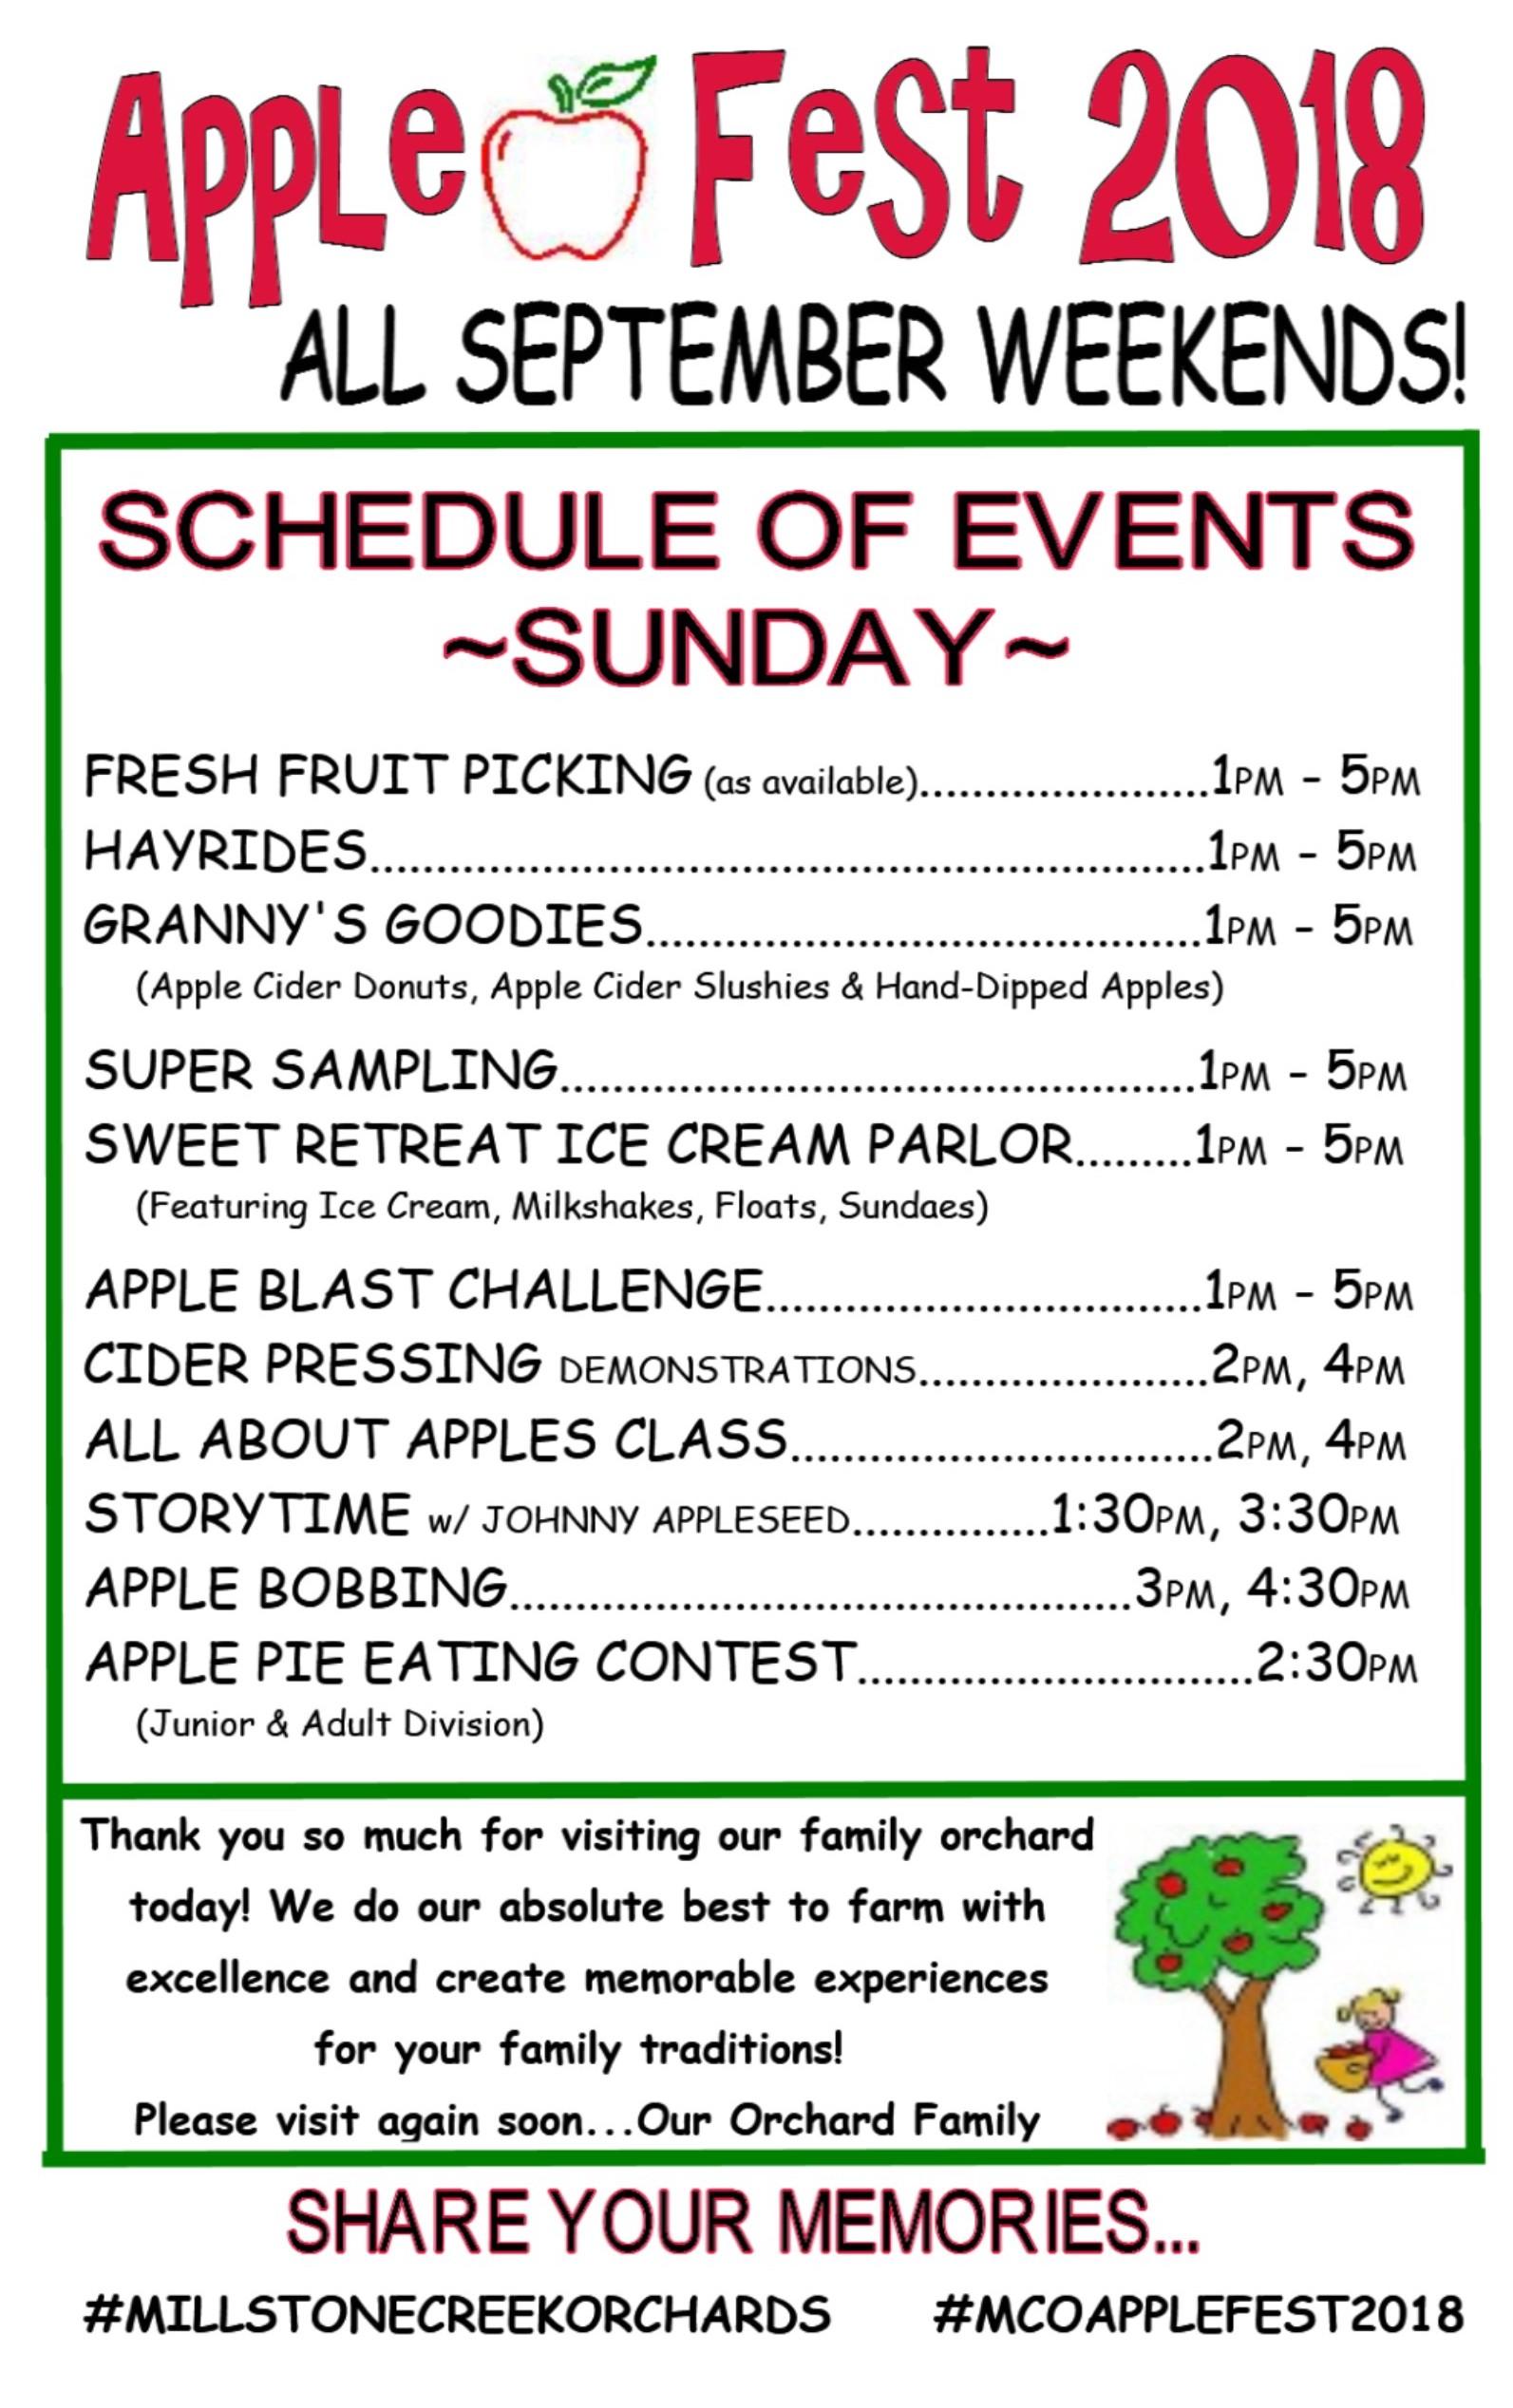 AppleFest - Schedule of Events Sunday.jpg